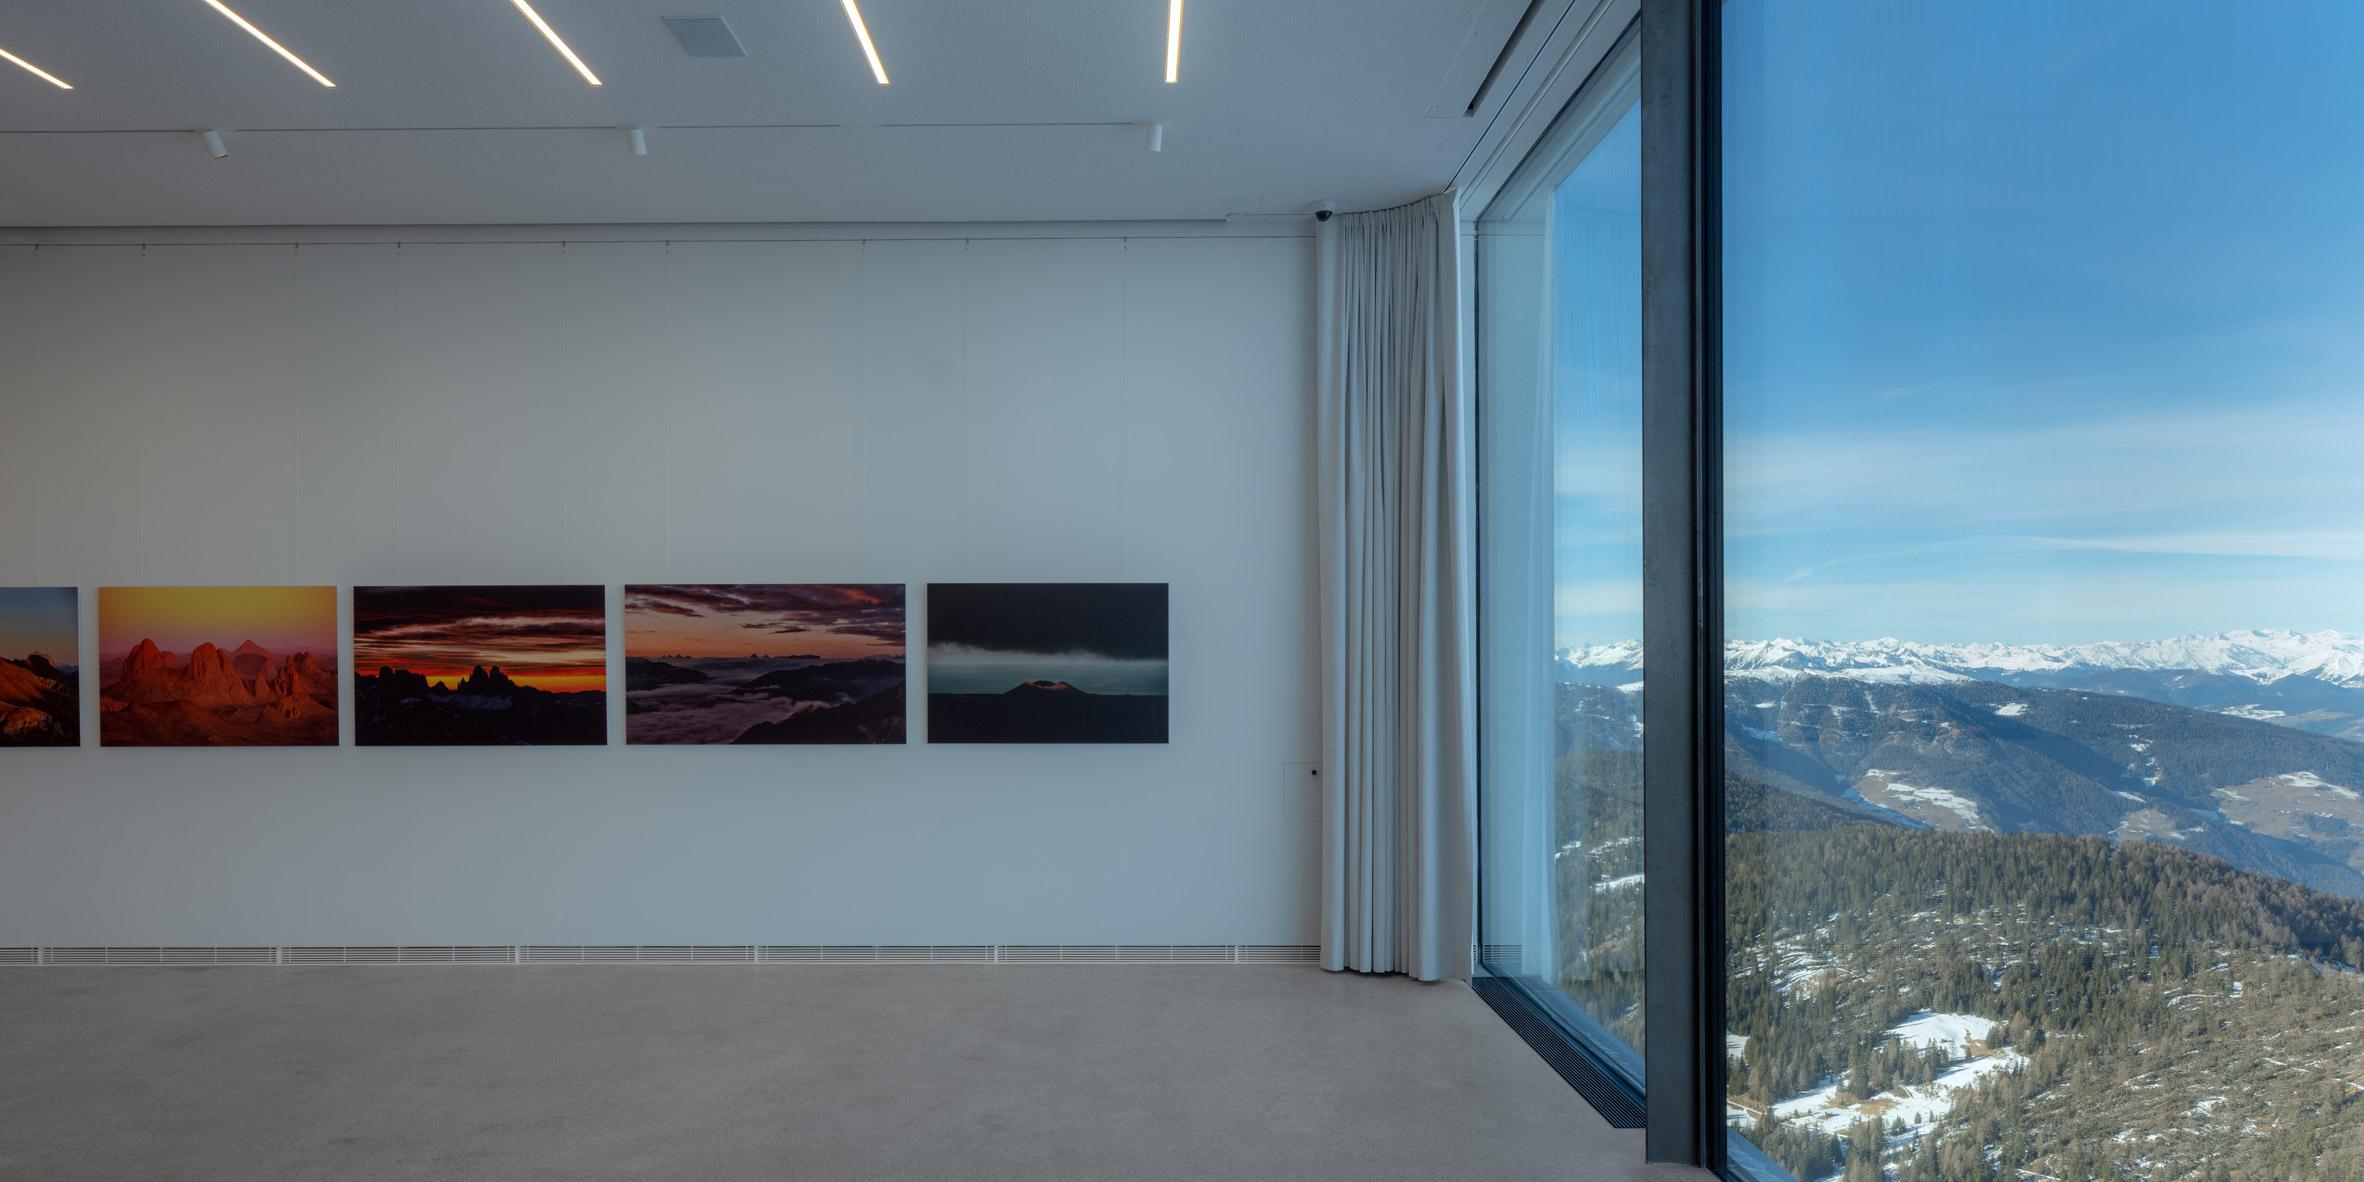 Interiors of Lumen Museum of Mountain Photography by Gerhard Mahlknecht of EM2